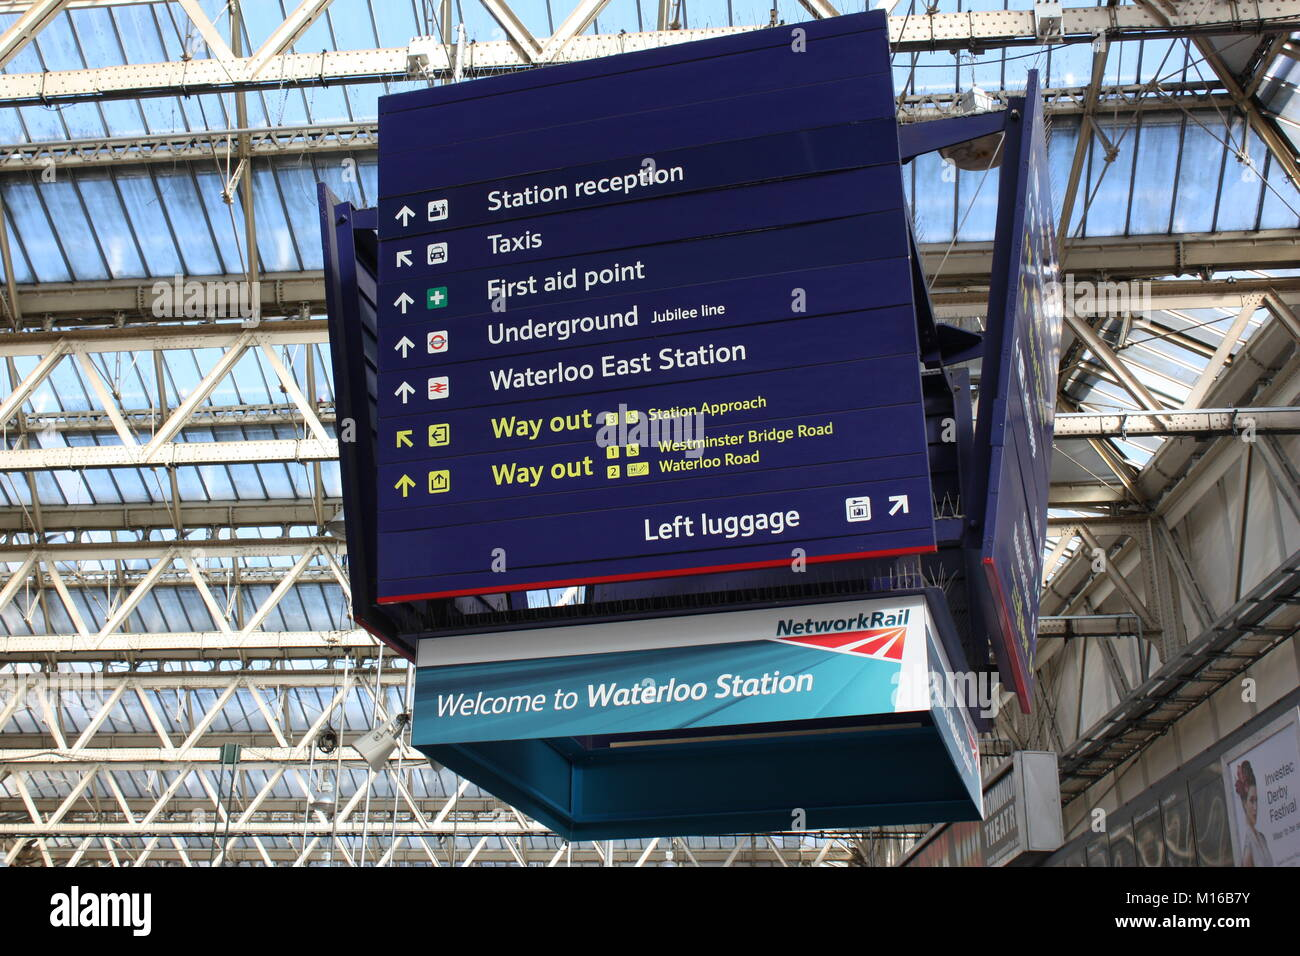 Direction board in Waterloo train station in London, UK Stock Photo